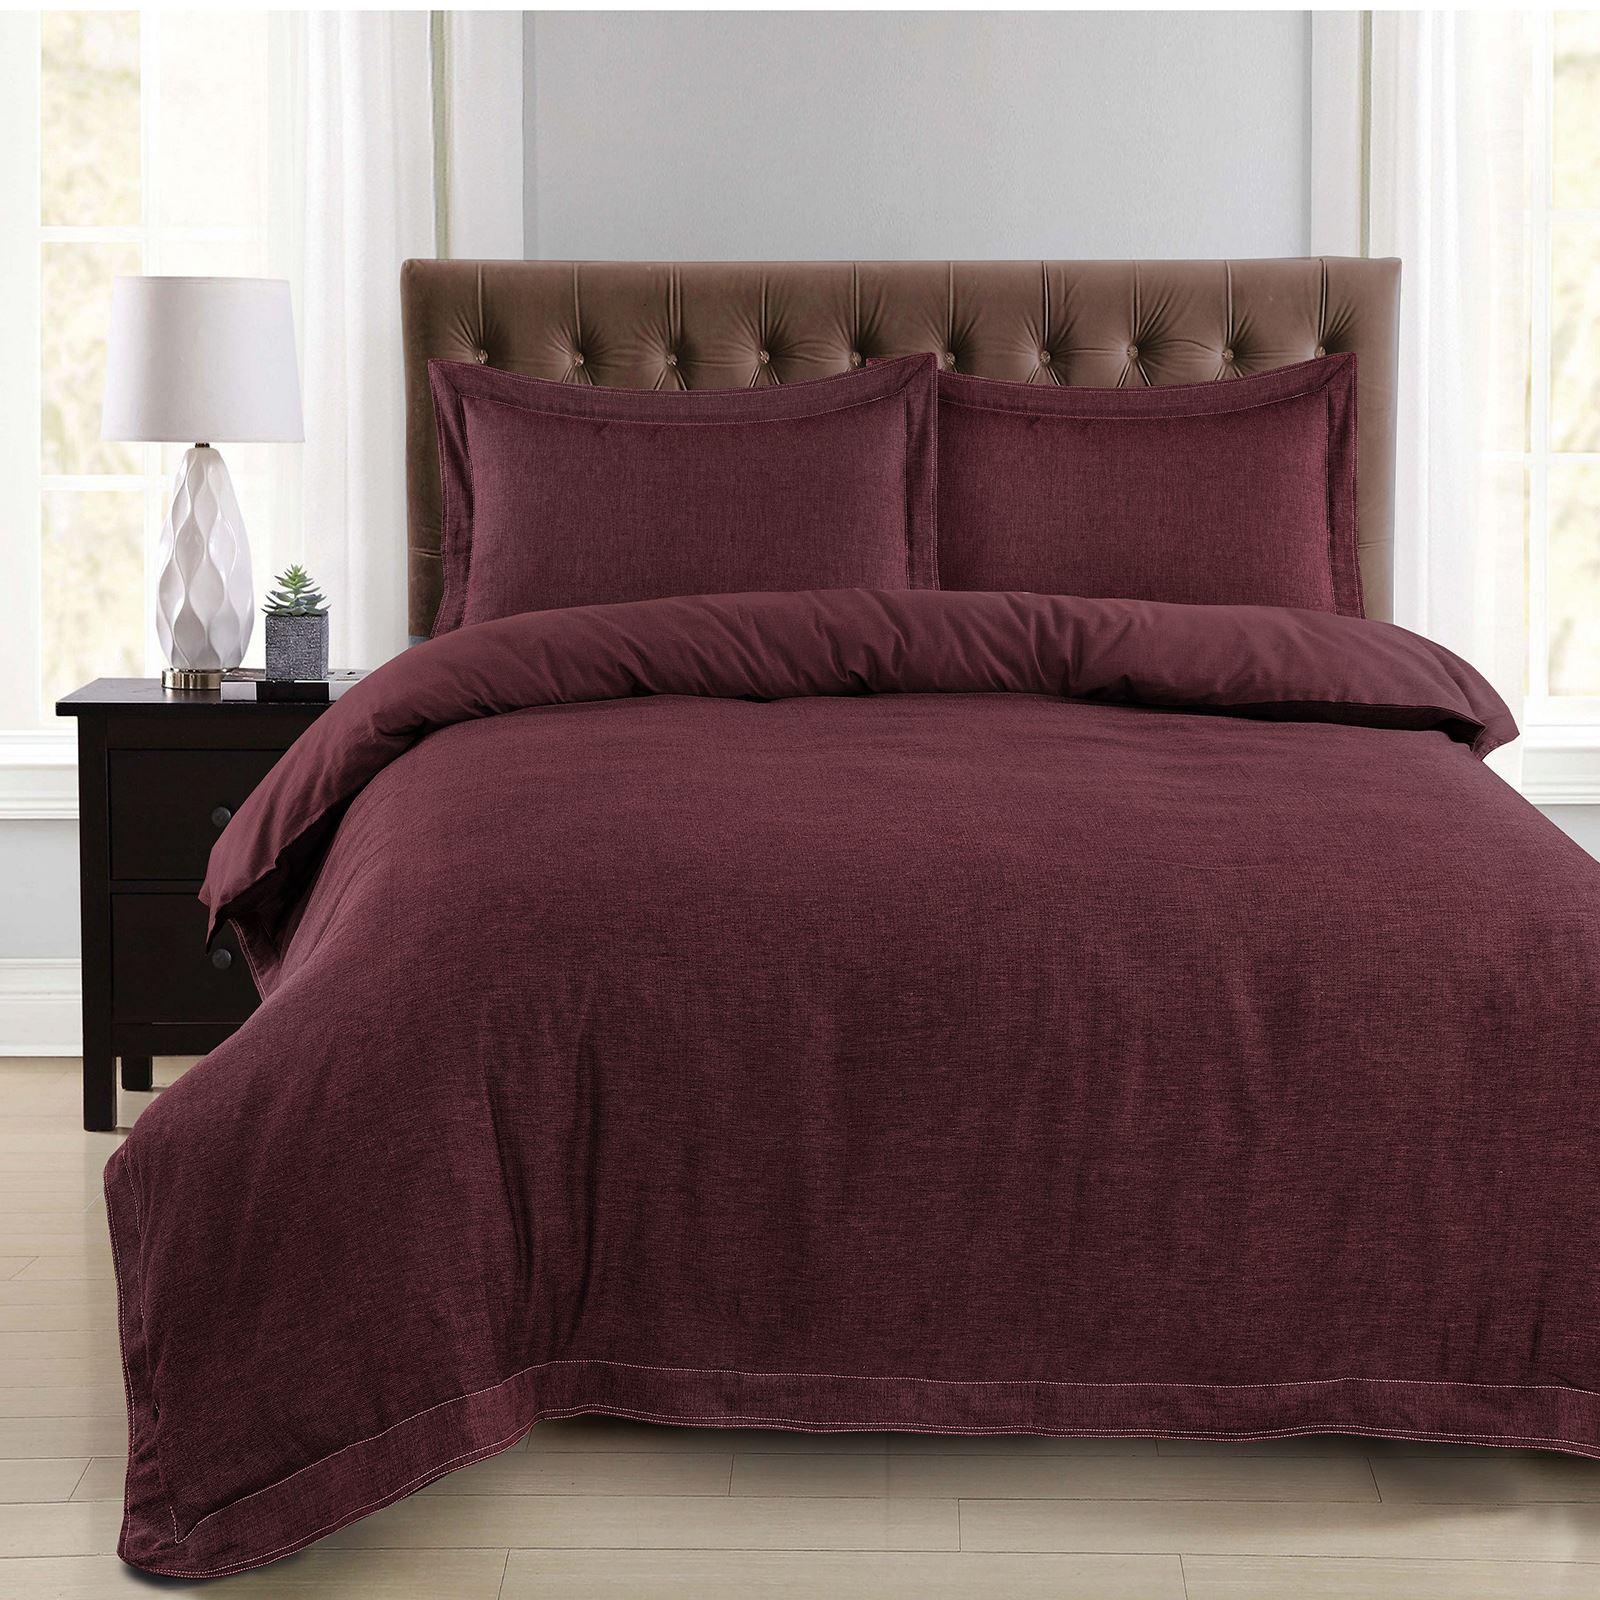 Luxury-Herringbone-Woven-100-Cotton-Duvet-Cover-Bedding-Set-Single-Double-King thumbnail 7